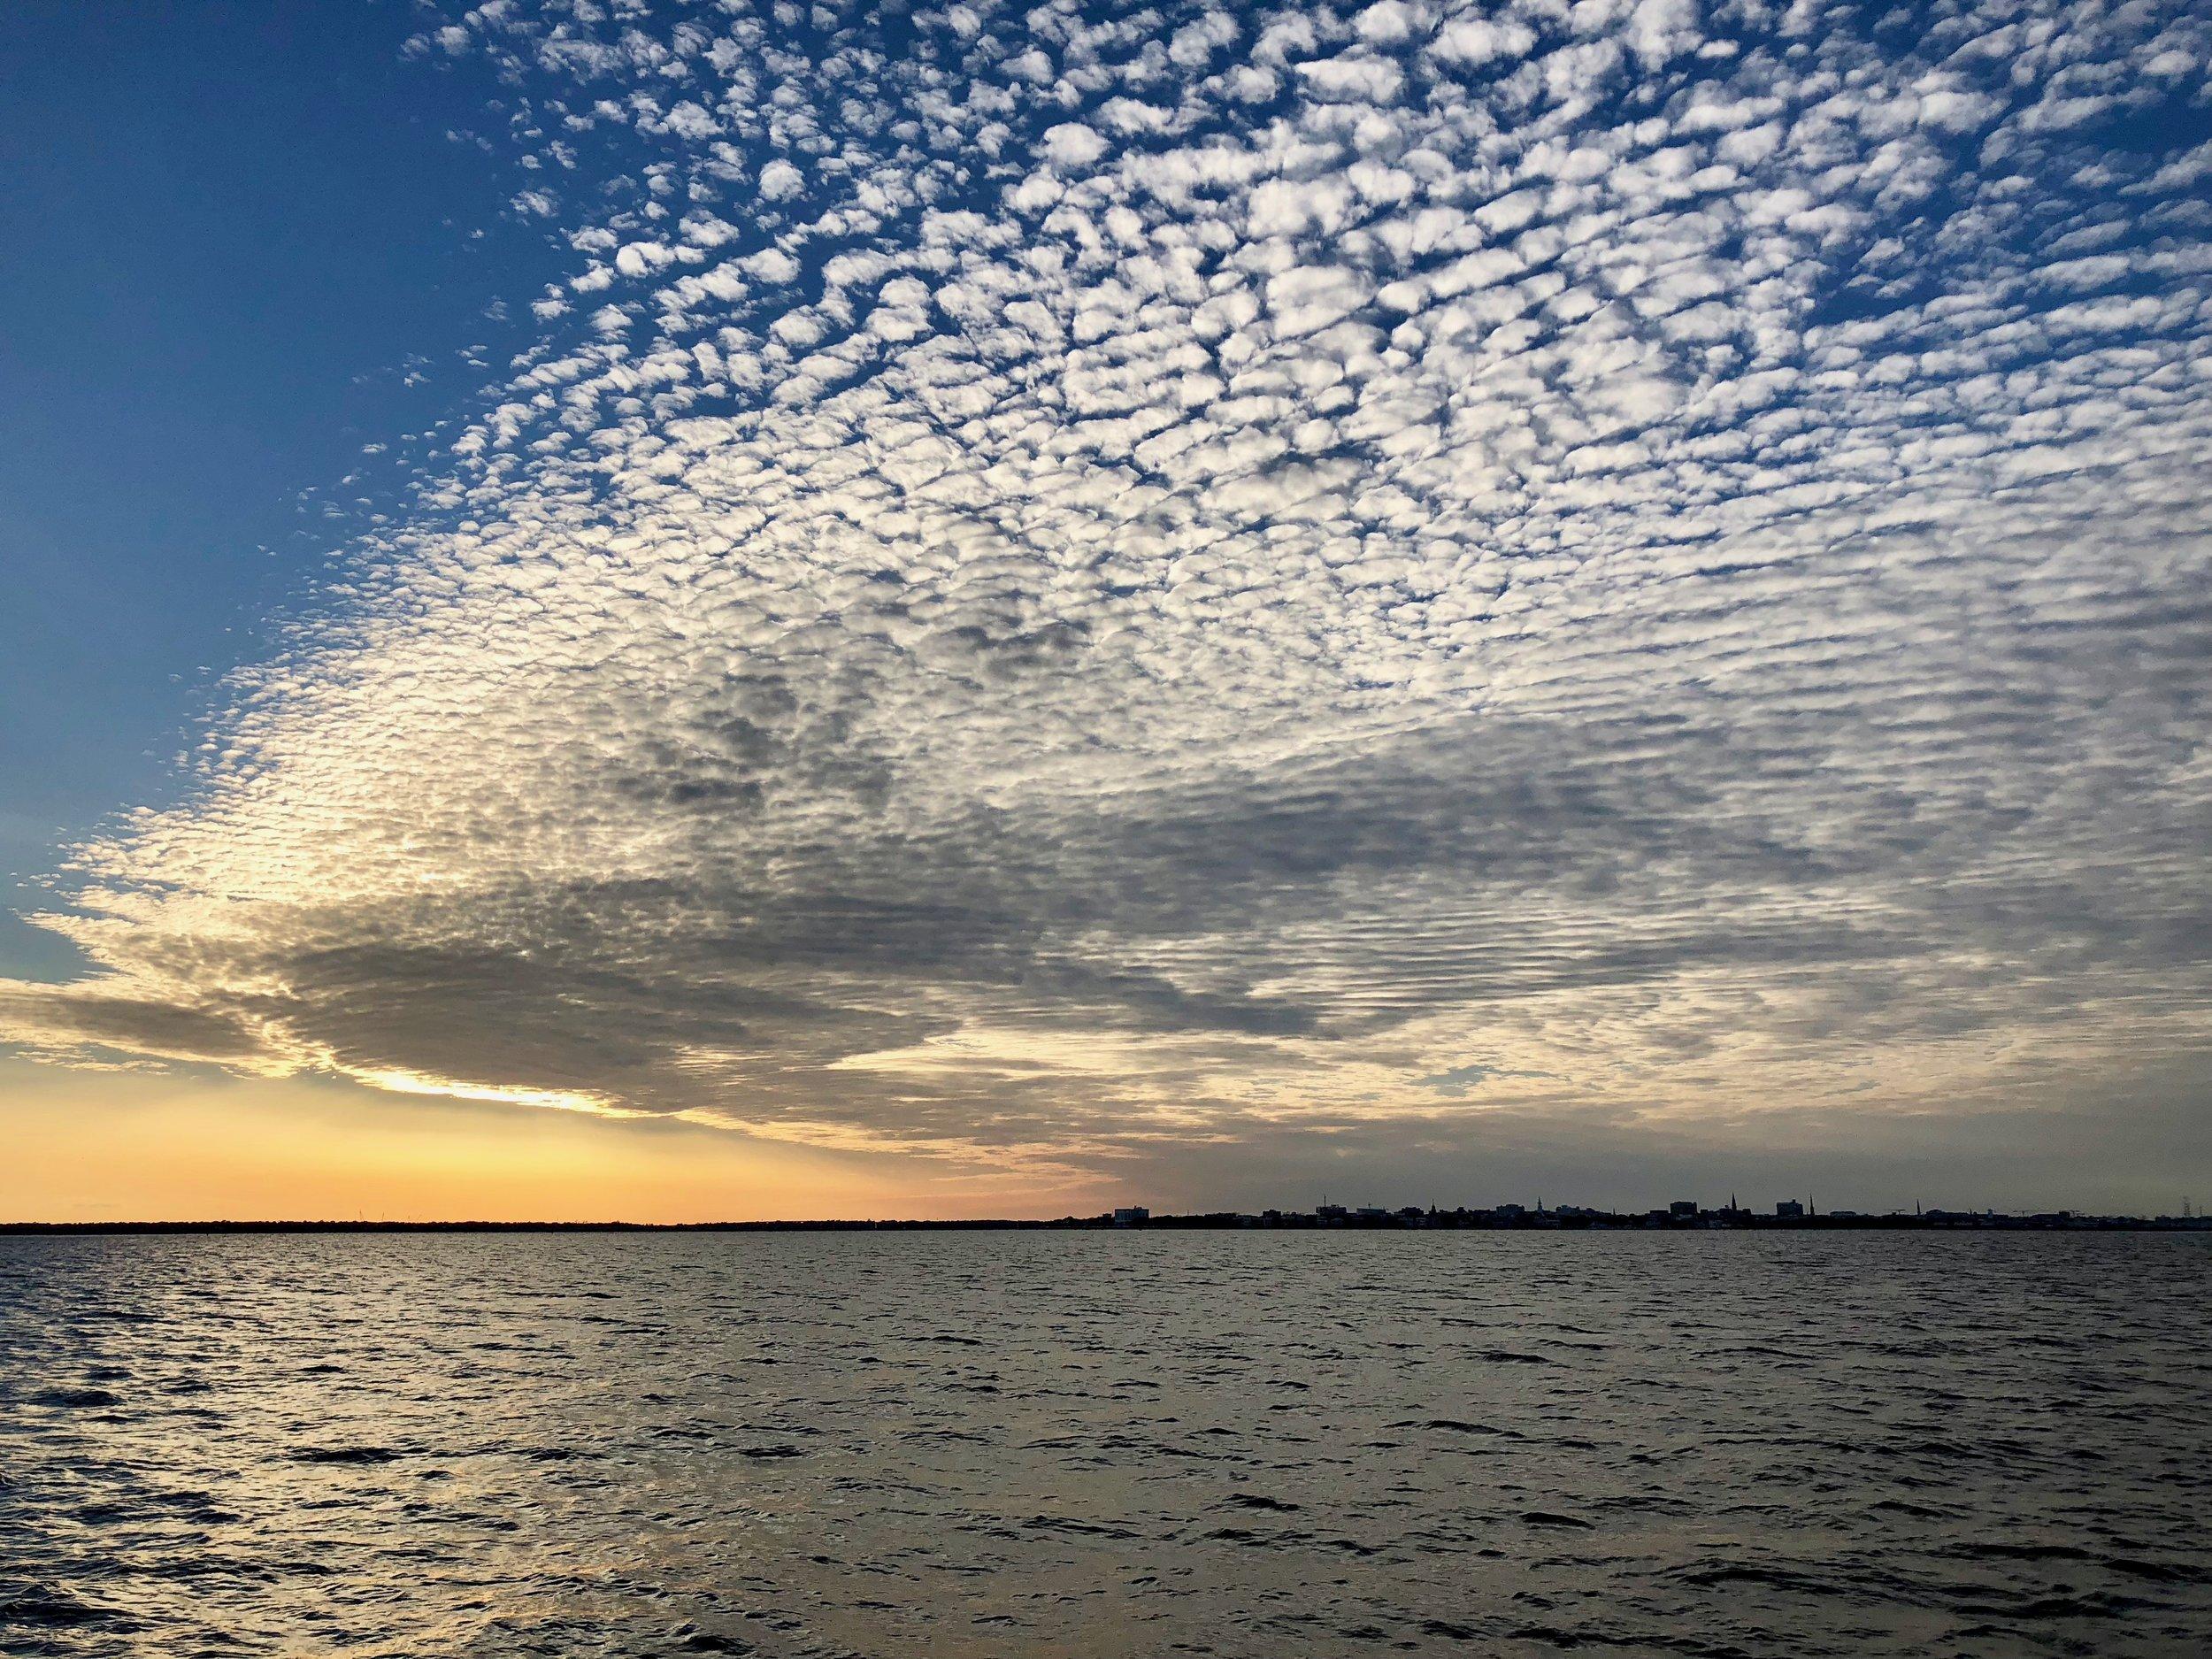 Charleston Harbor from The Schooner Pride